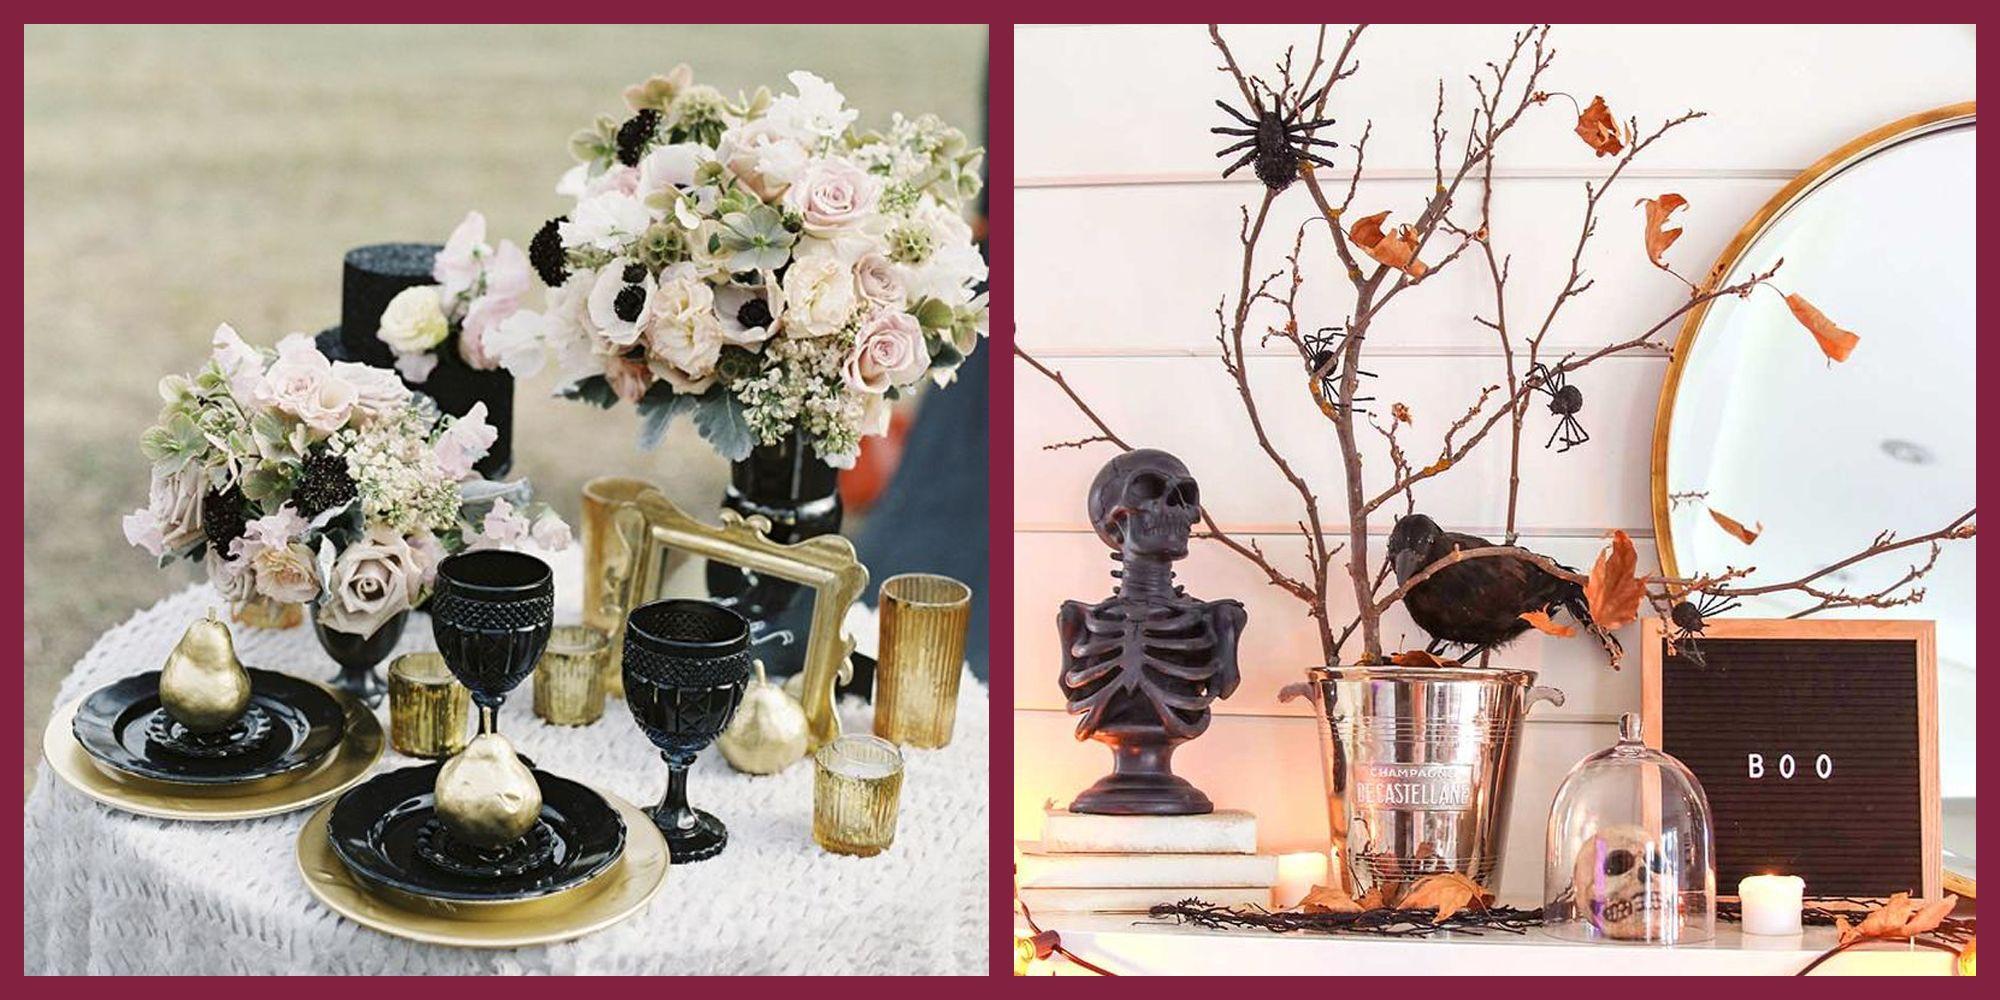 42 Elevated Halloween Decorations 2019 Classy Halloween Decor Ideas